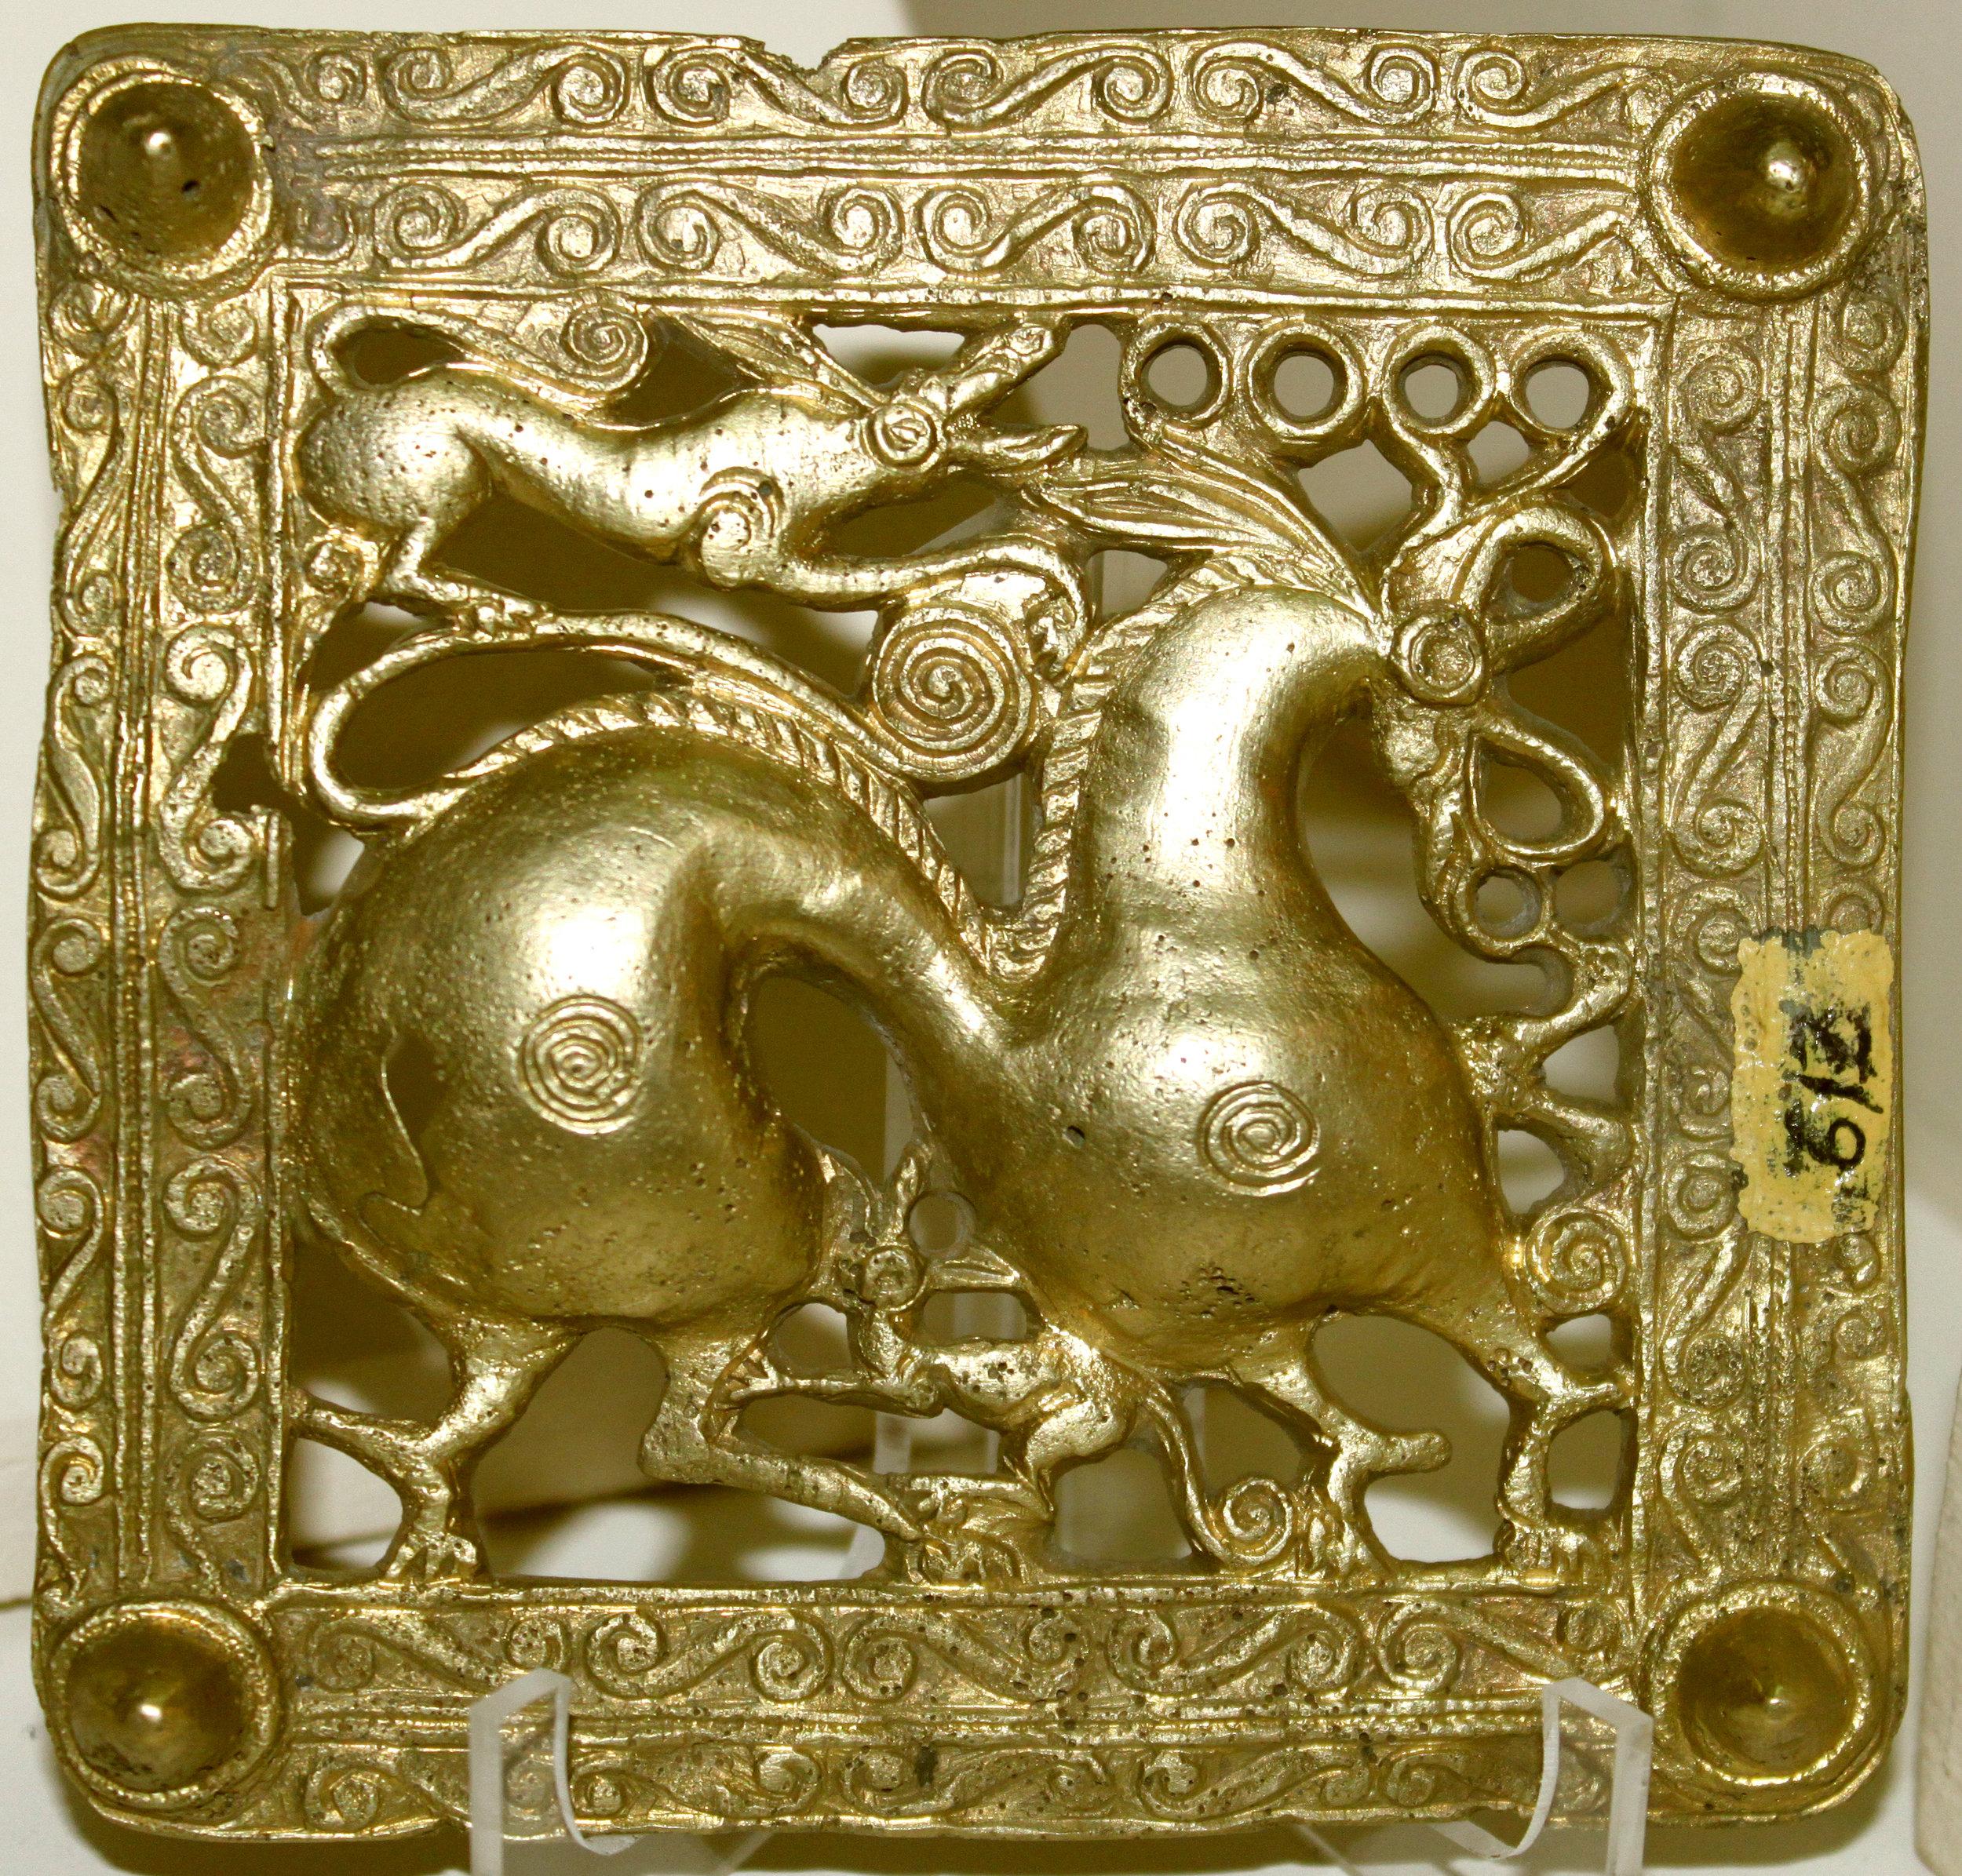 Gold Scythian belt title from Mingachevir (ancient Scythian kingdom), Azerbaijan, and the 7th century BC. Wikicommons